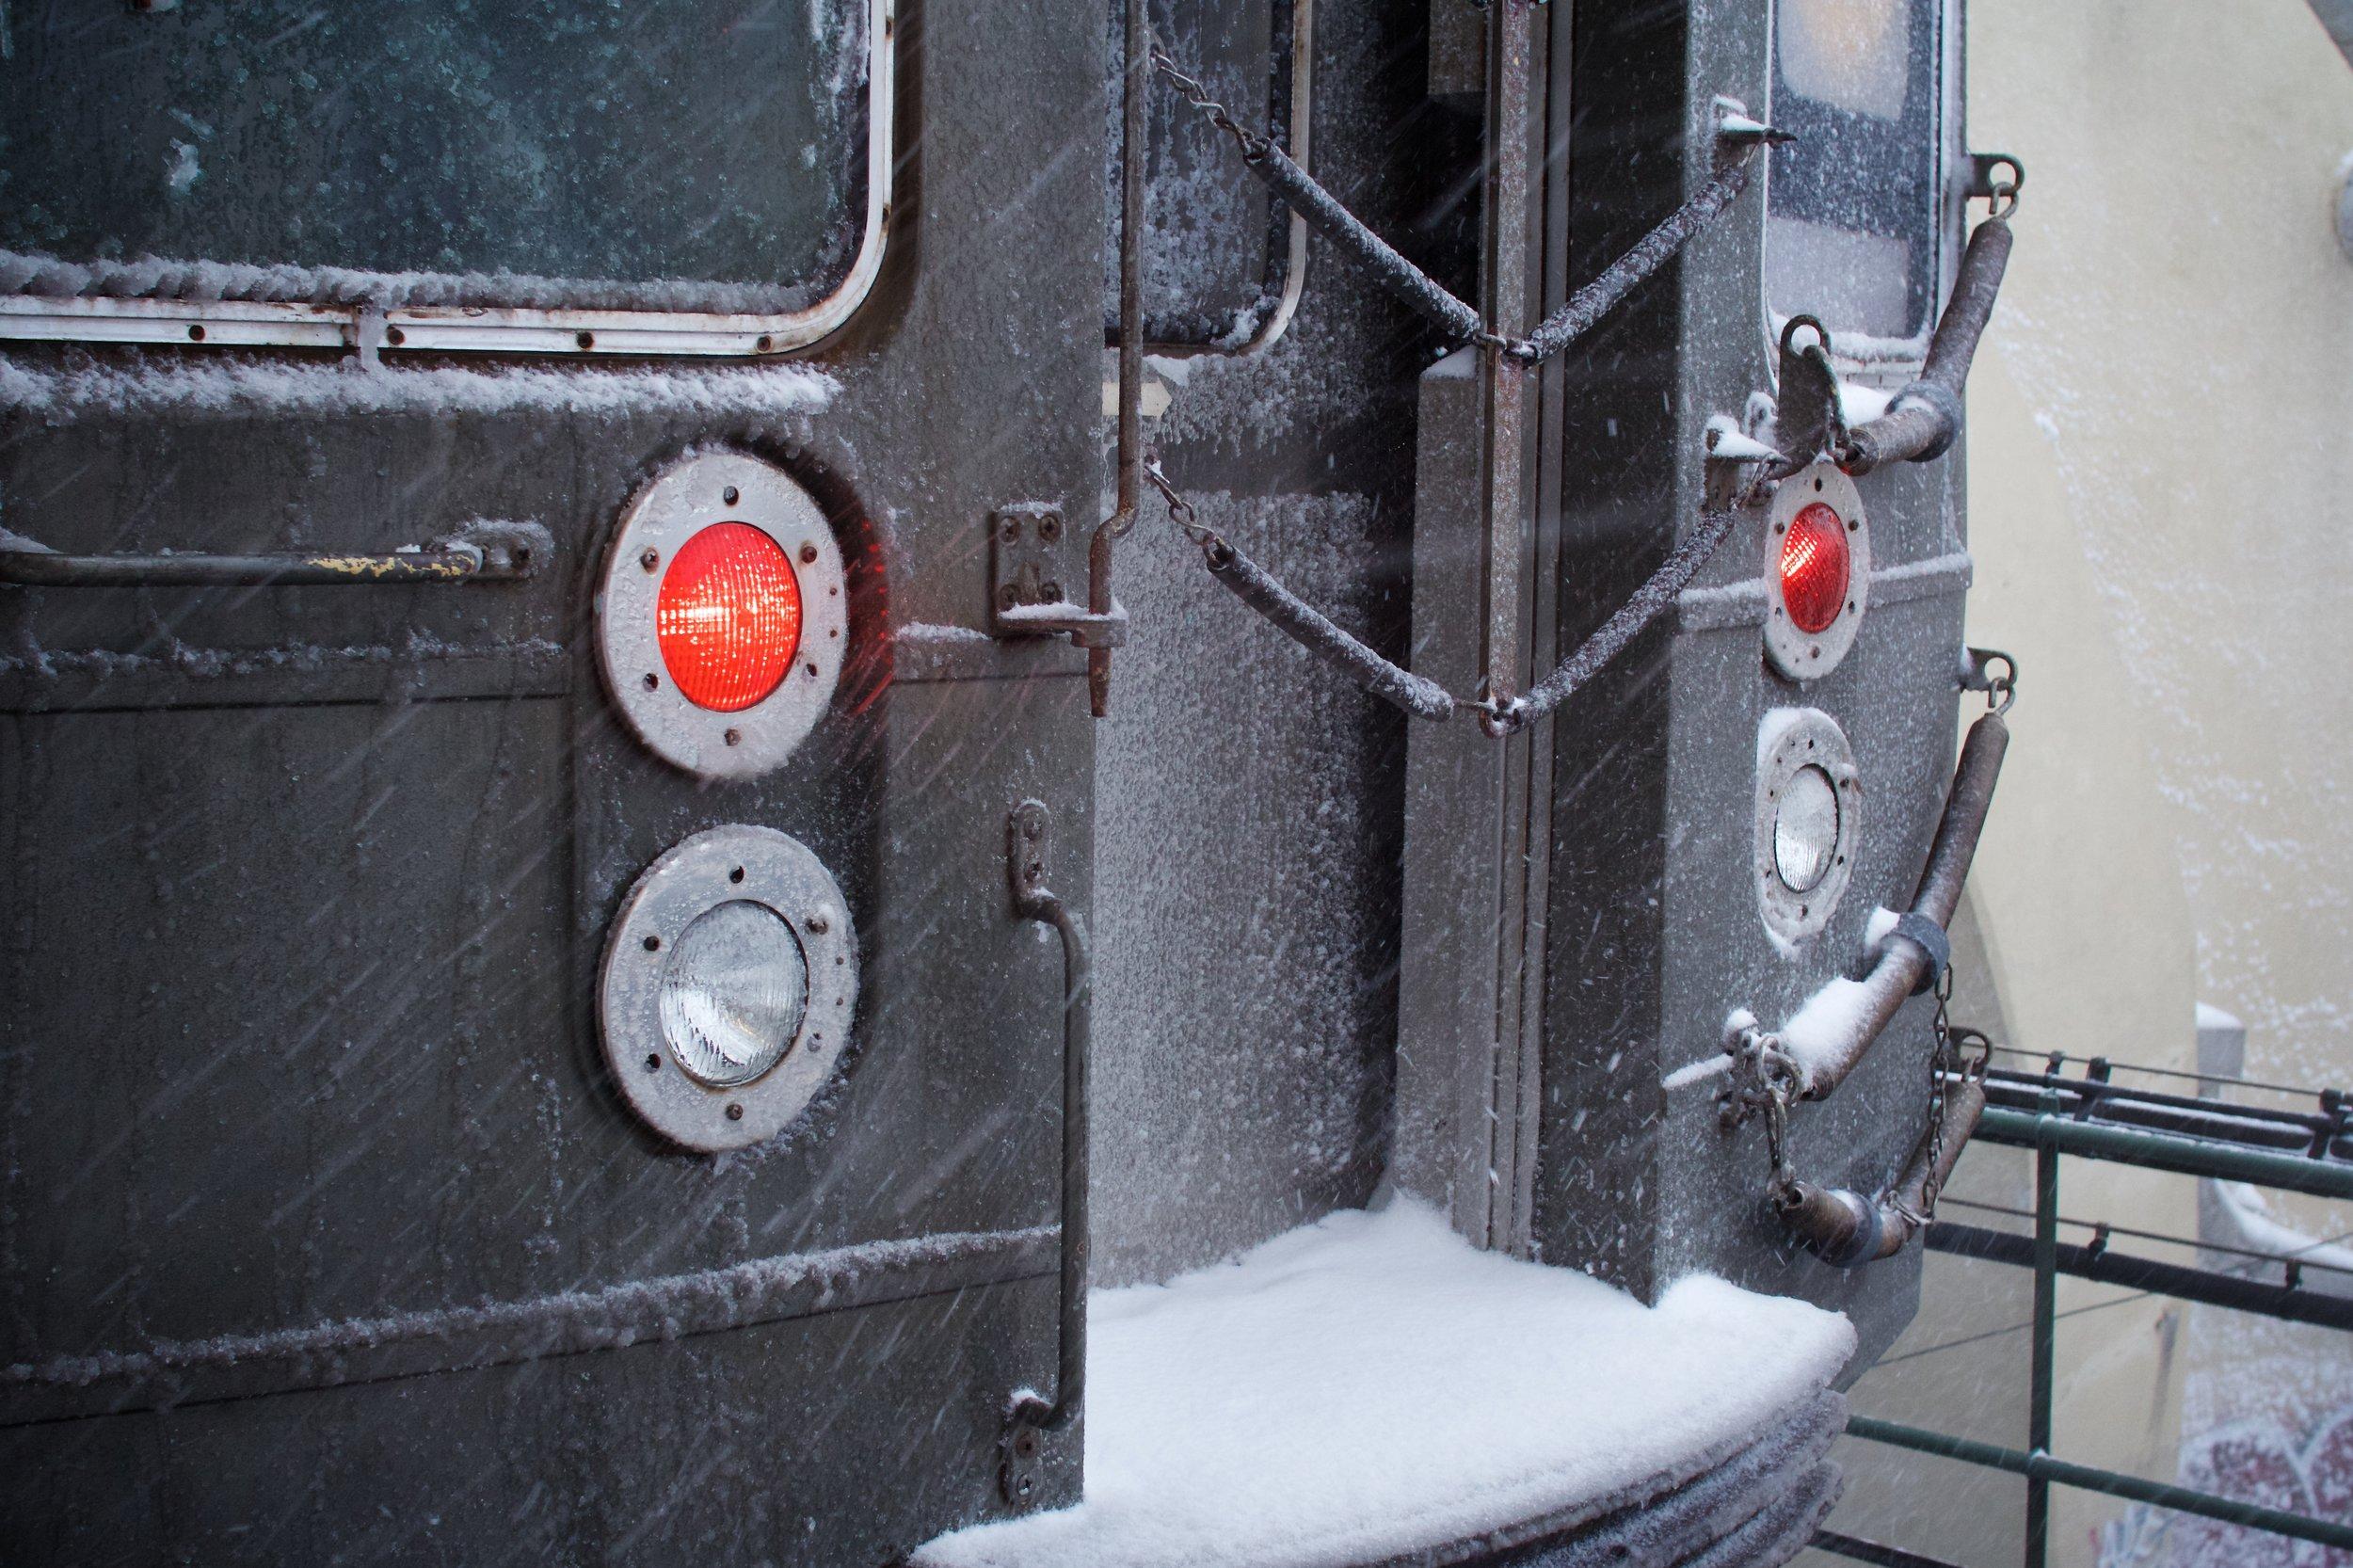 Train, close-up